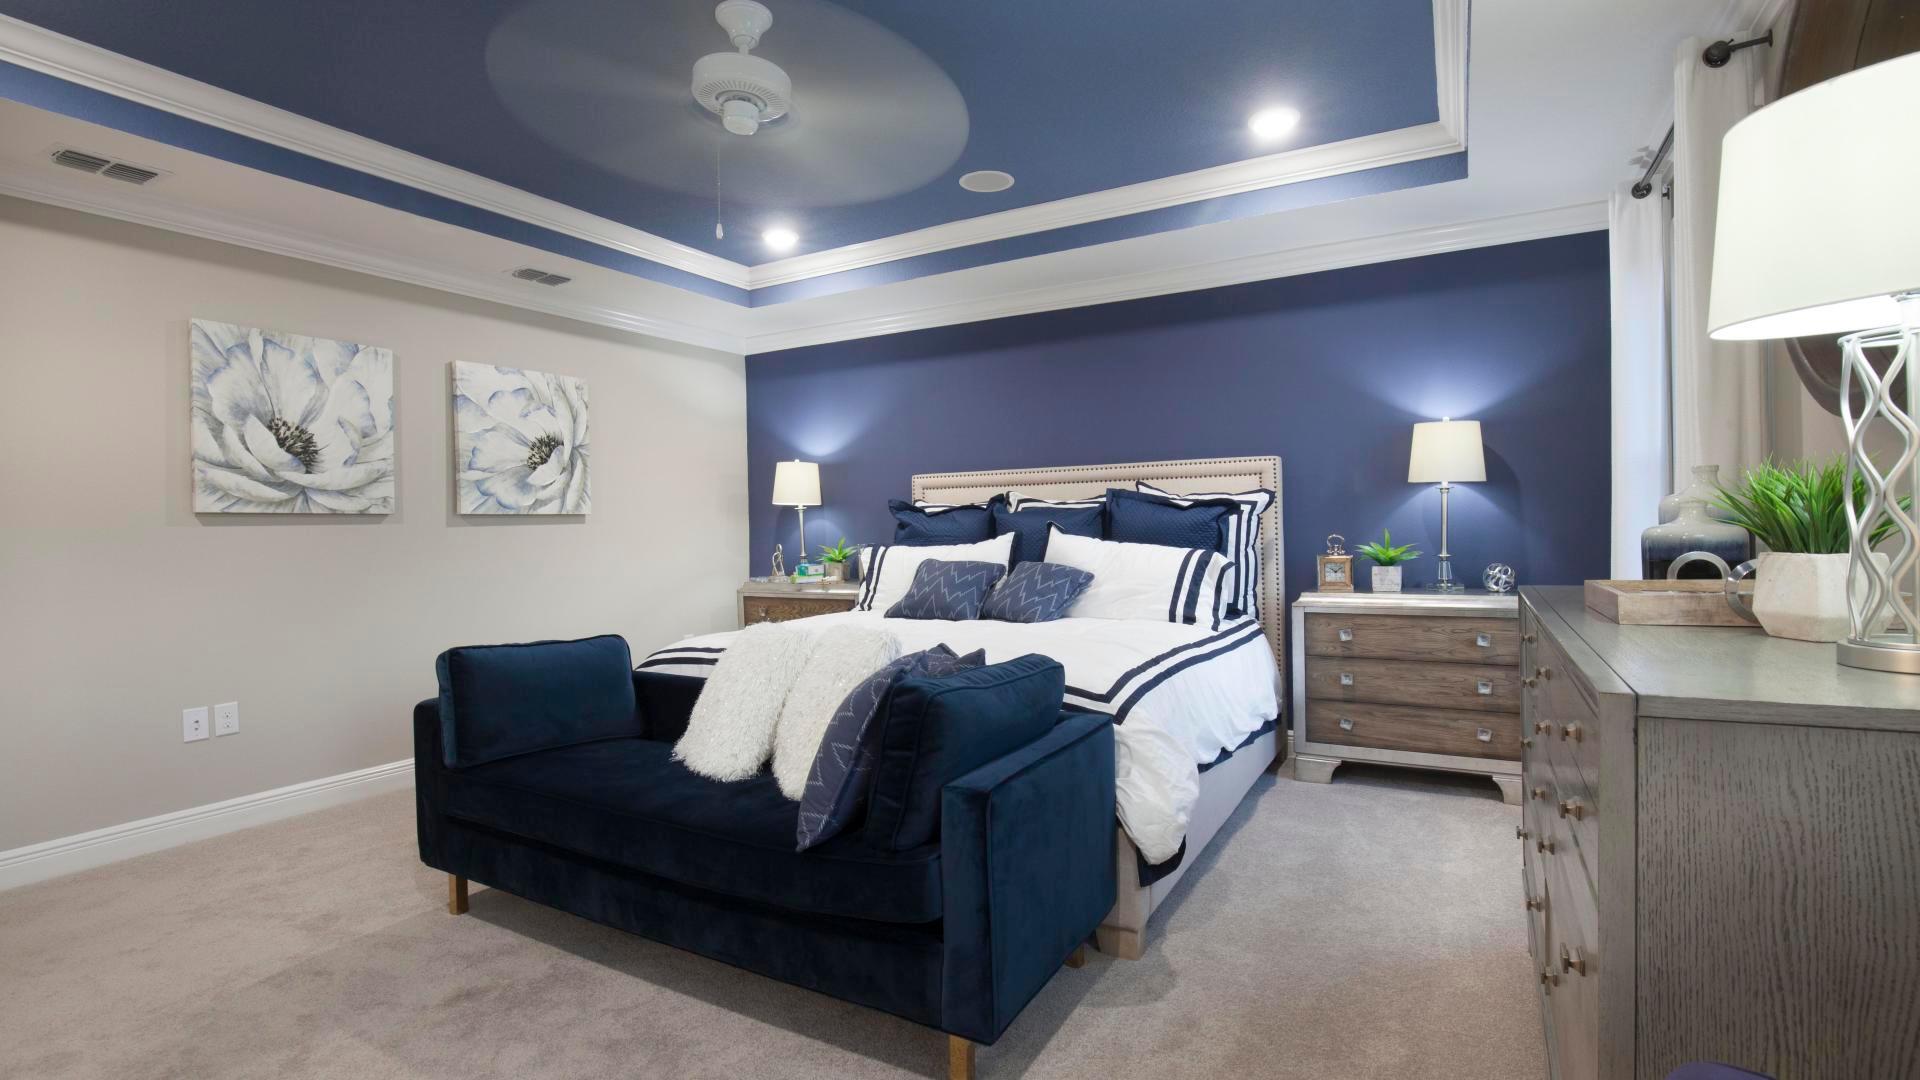 Bedroom featured in the Carlisle By Maronda Homes in Daytona Beach, FL